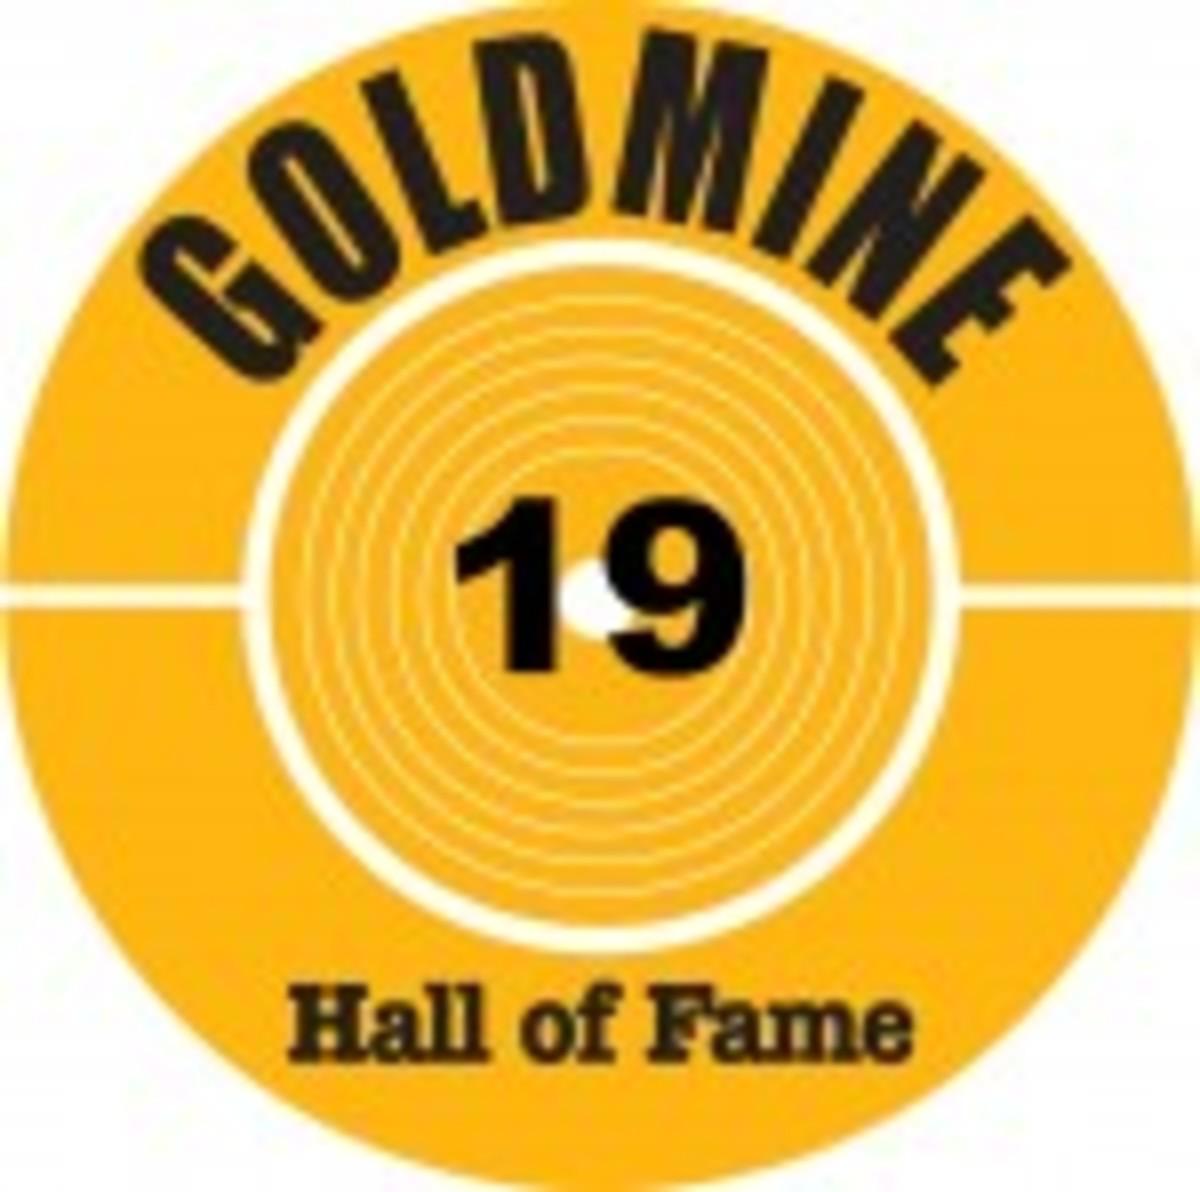 Goldmine HOF 19